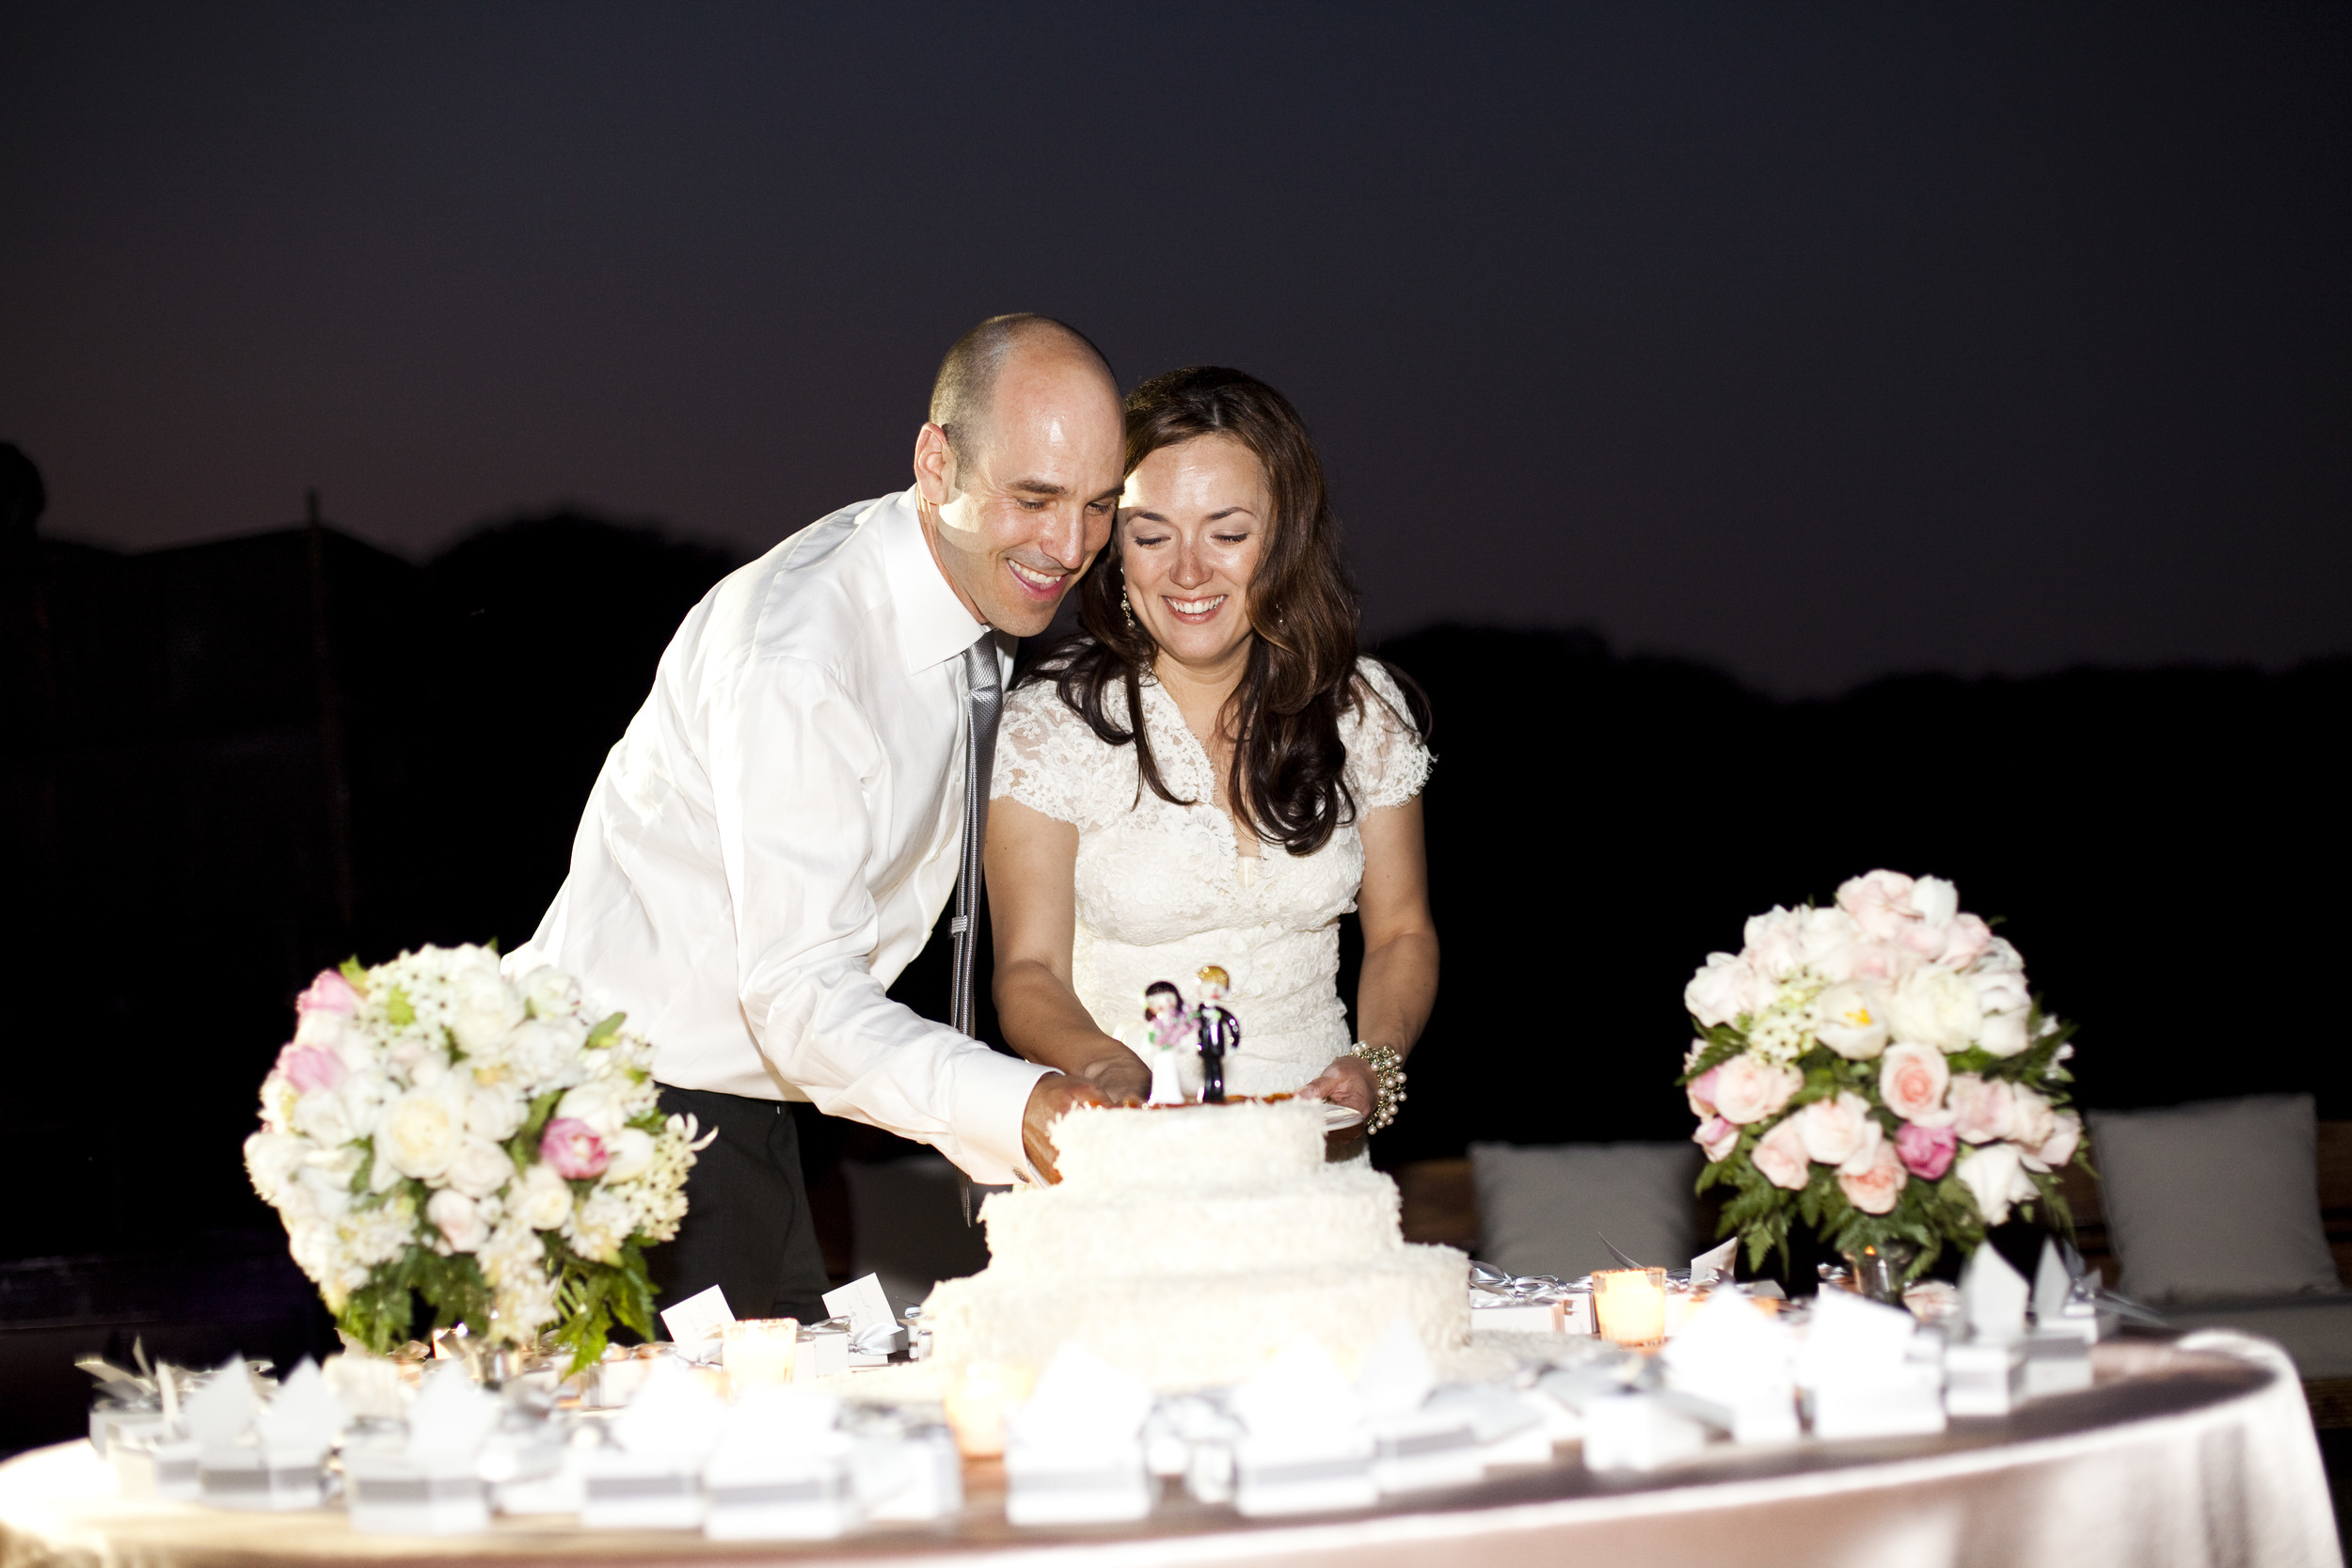 Ceci_New_York_Style_Luxury_Custom_Mexico_Wedding_CeciBride_Letterpress_NewYork_Foil_Hacienda_de_San_Antonio_53.jpg